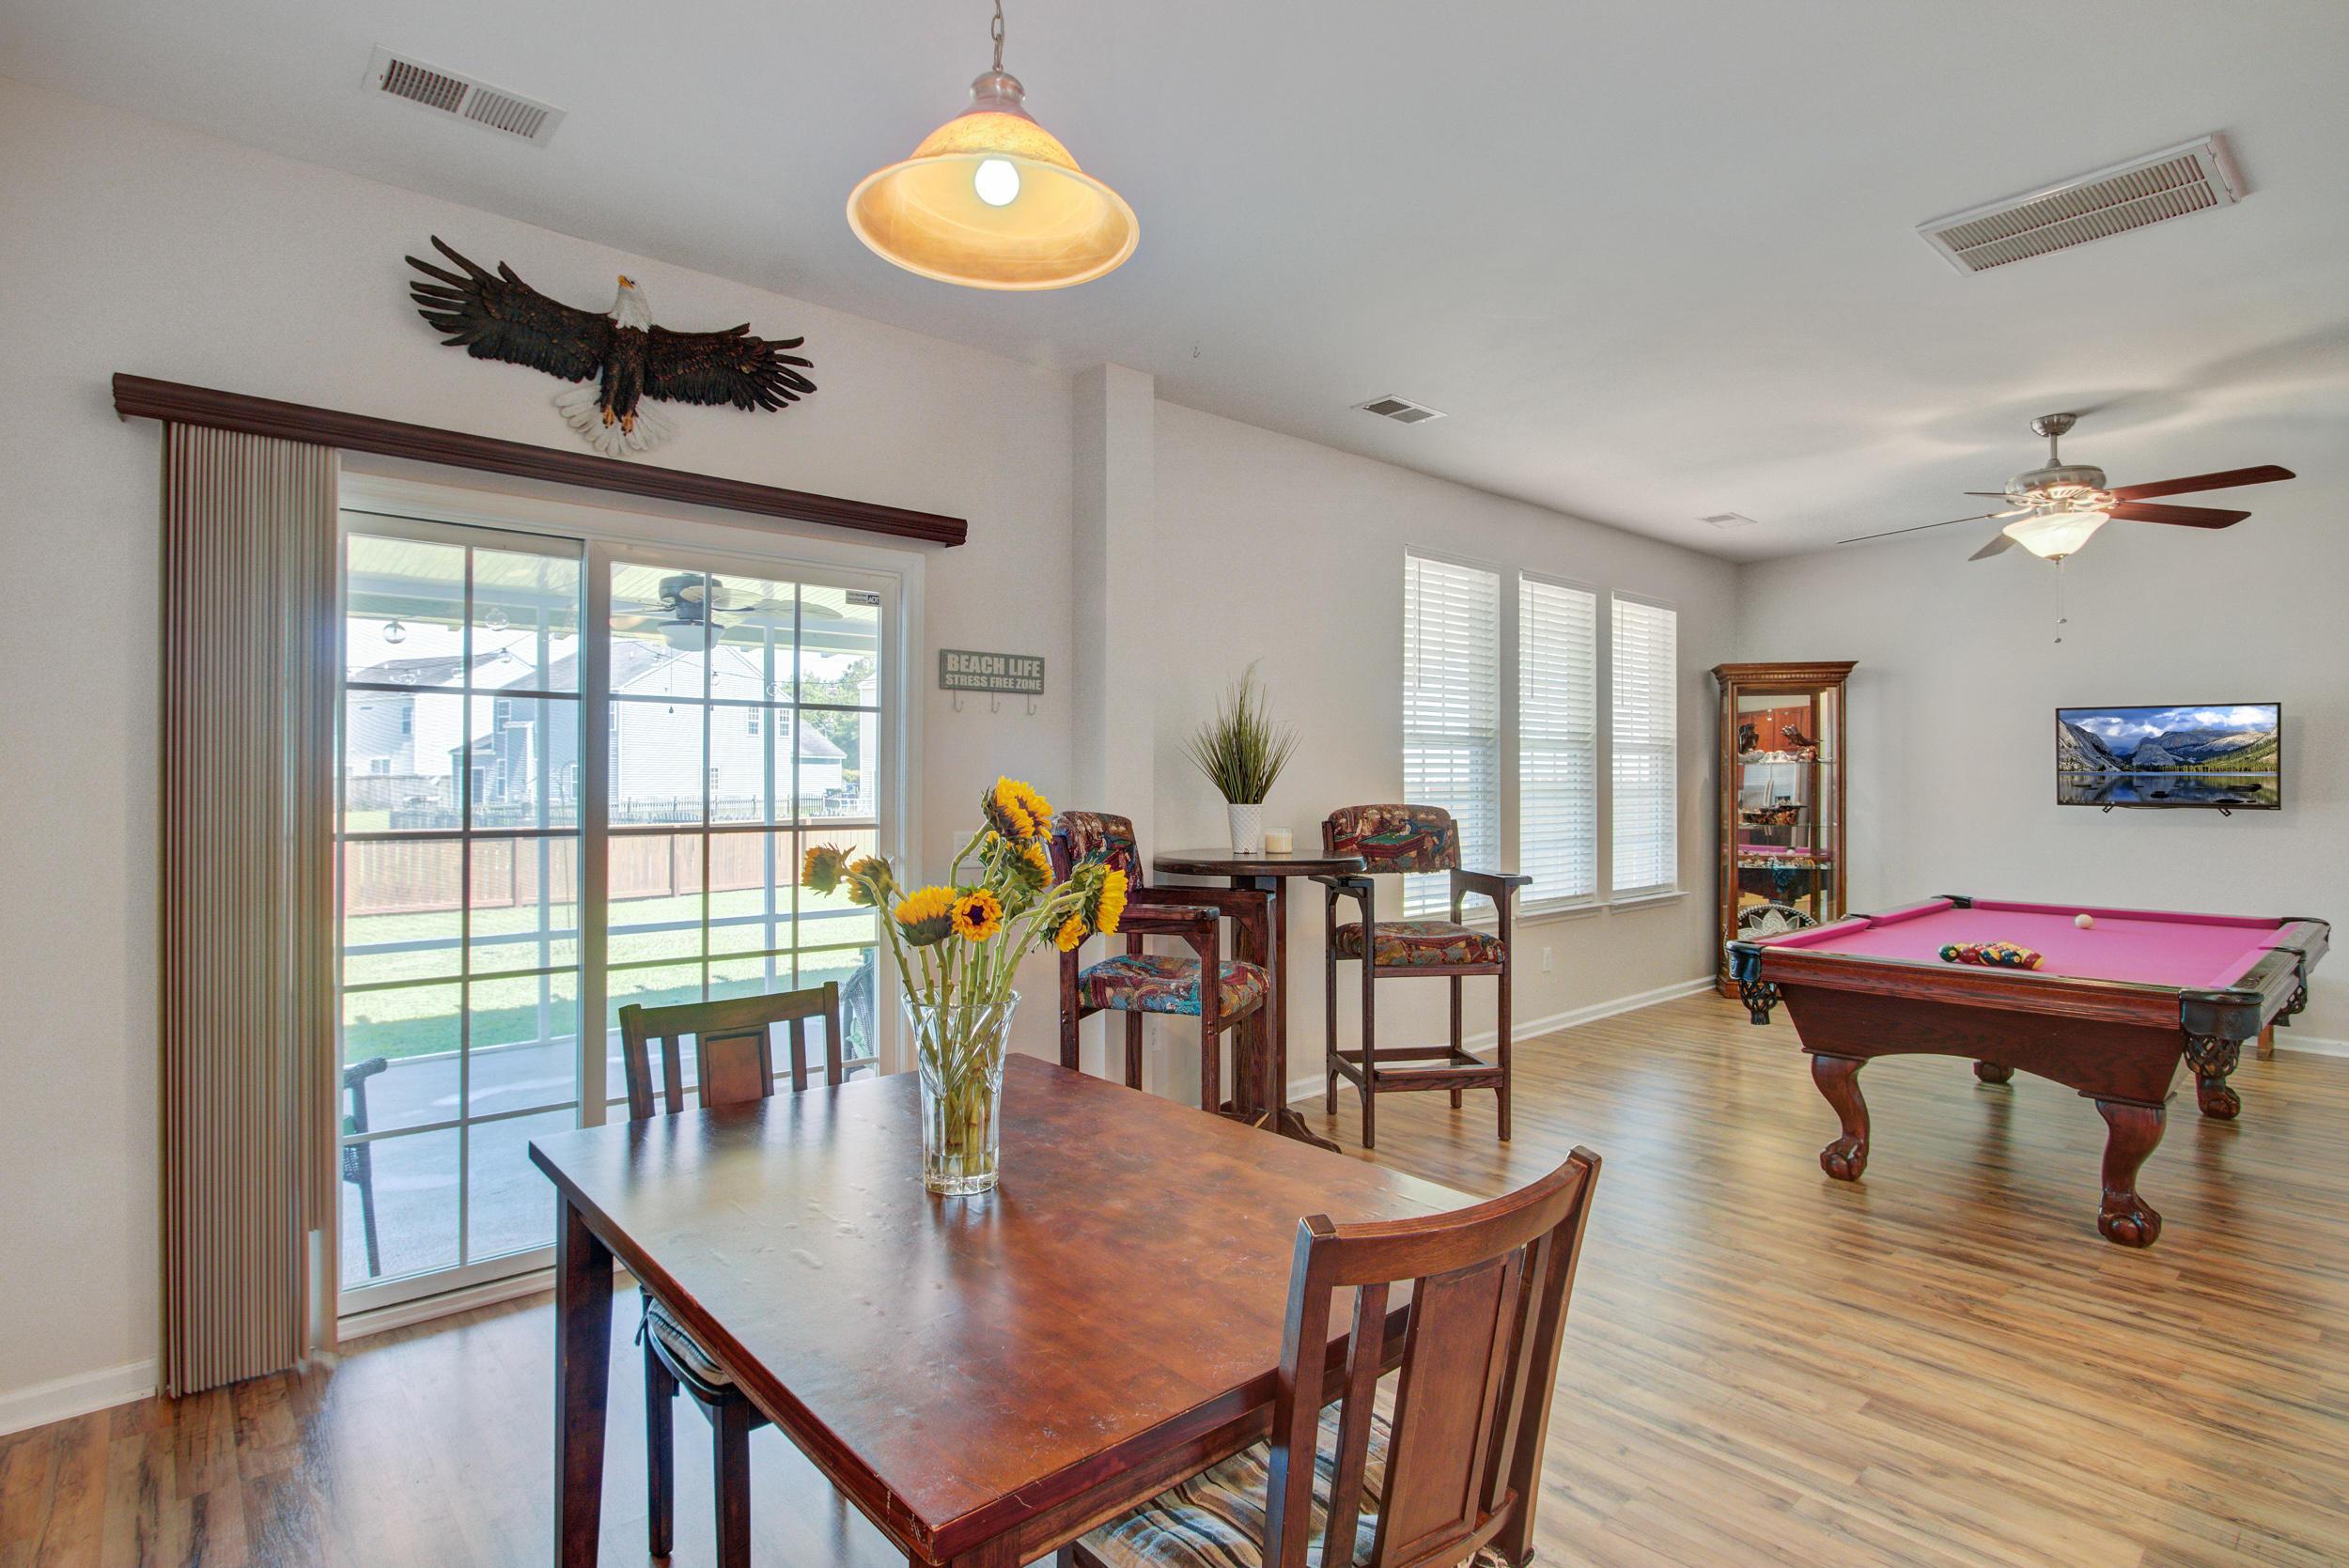 Oakley Pointe Homes For Sale - 576 English Oak, Moncks Corner, SC - 52